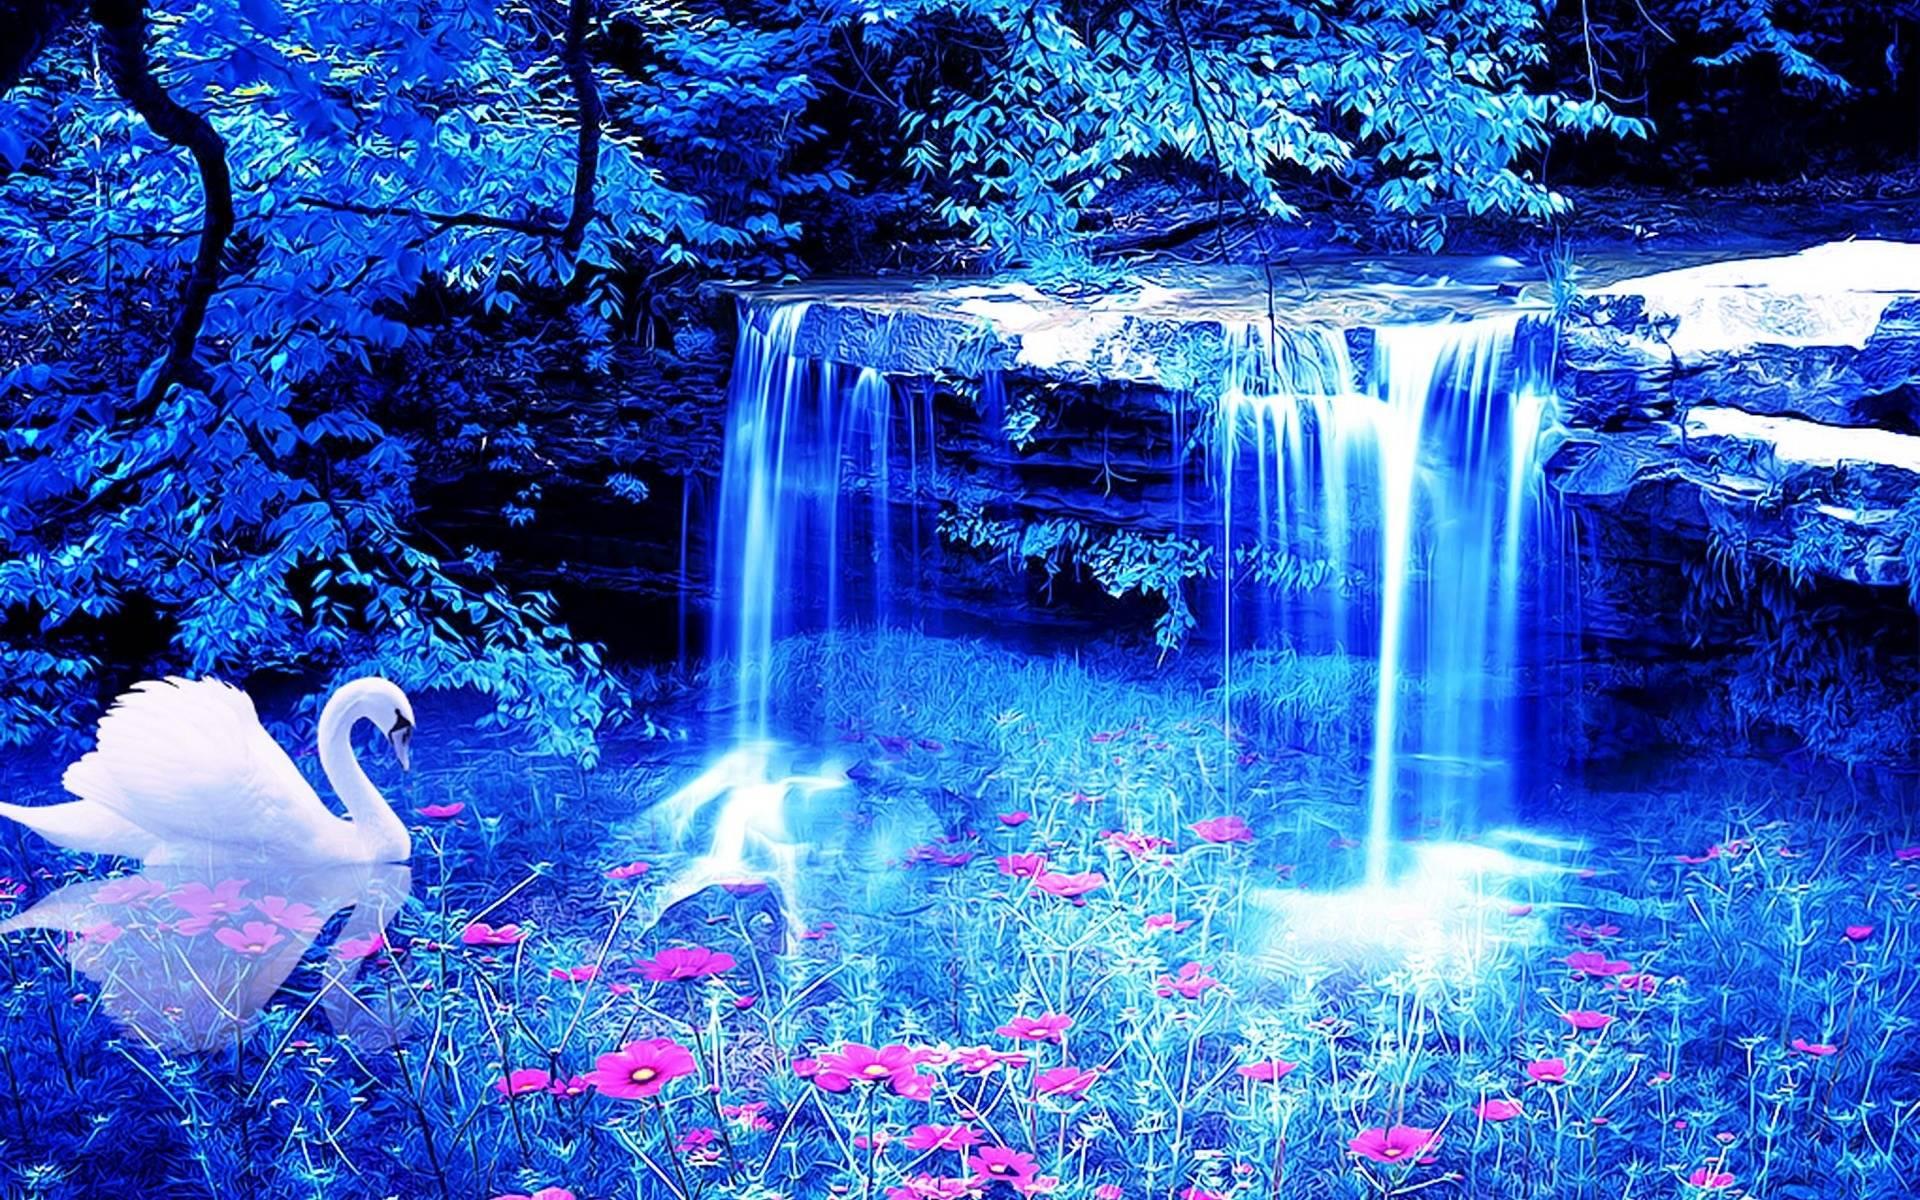 Water fall wallpapers wallpaper cave tropical waterfall desktop hd wallpaper beraplan voltagebd Image collections